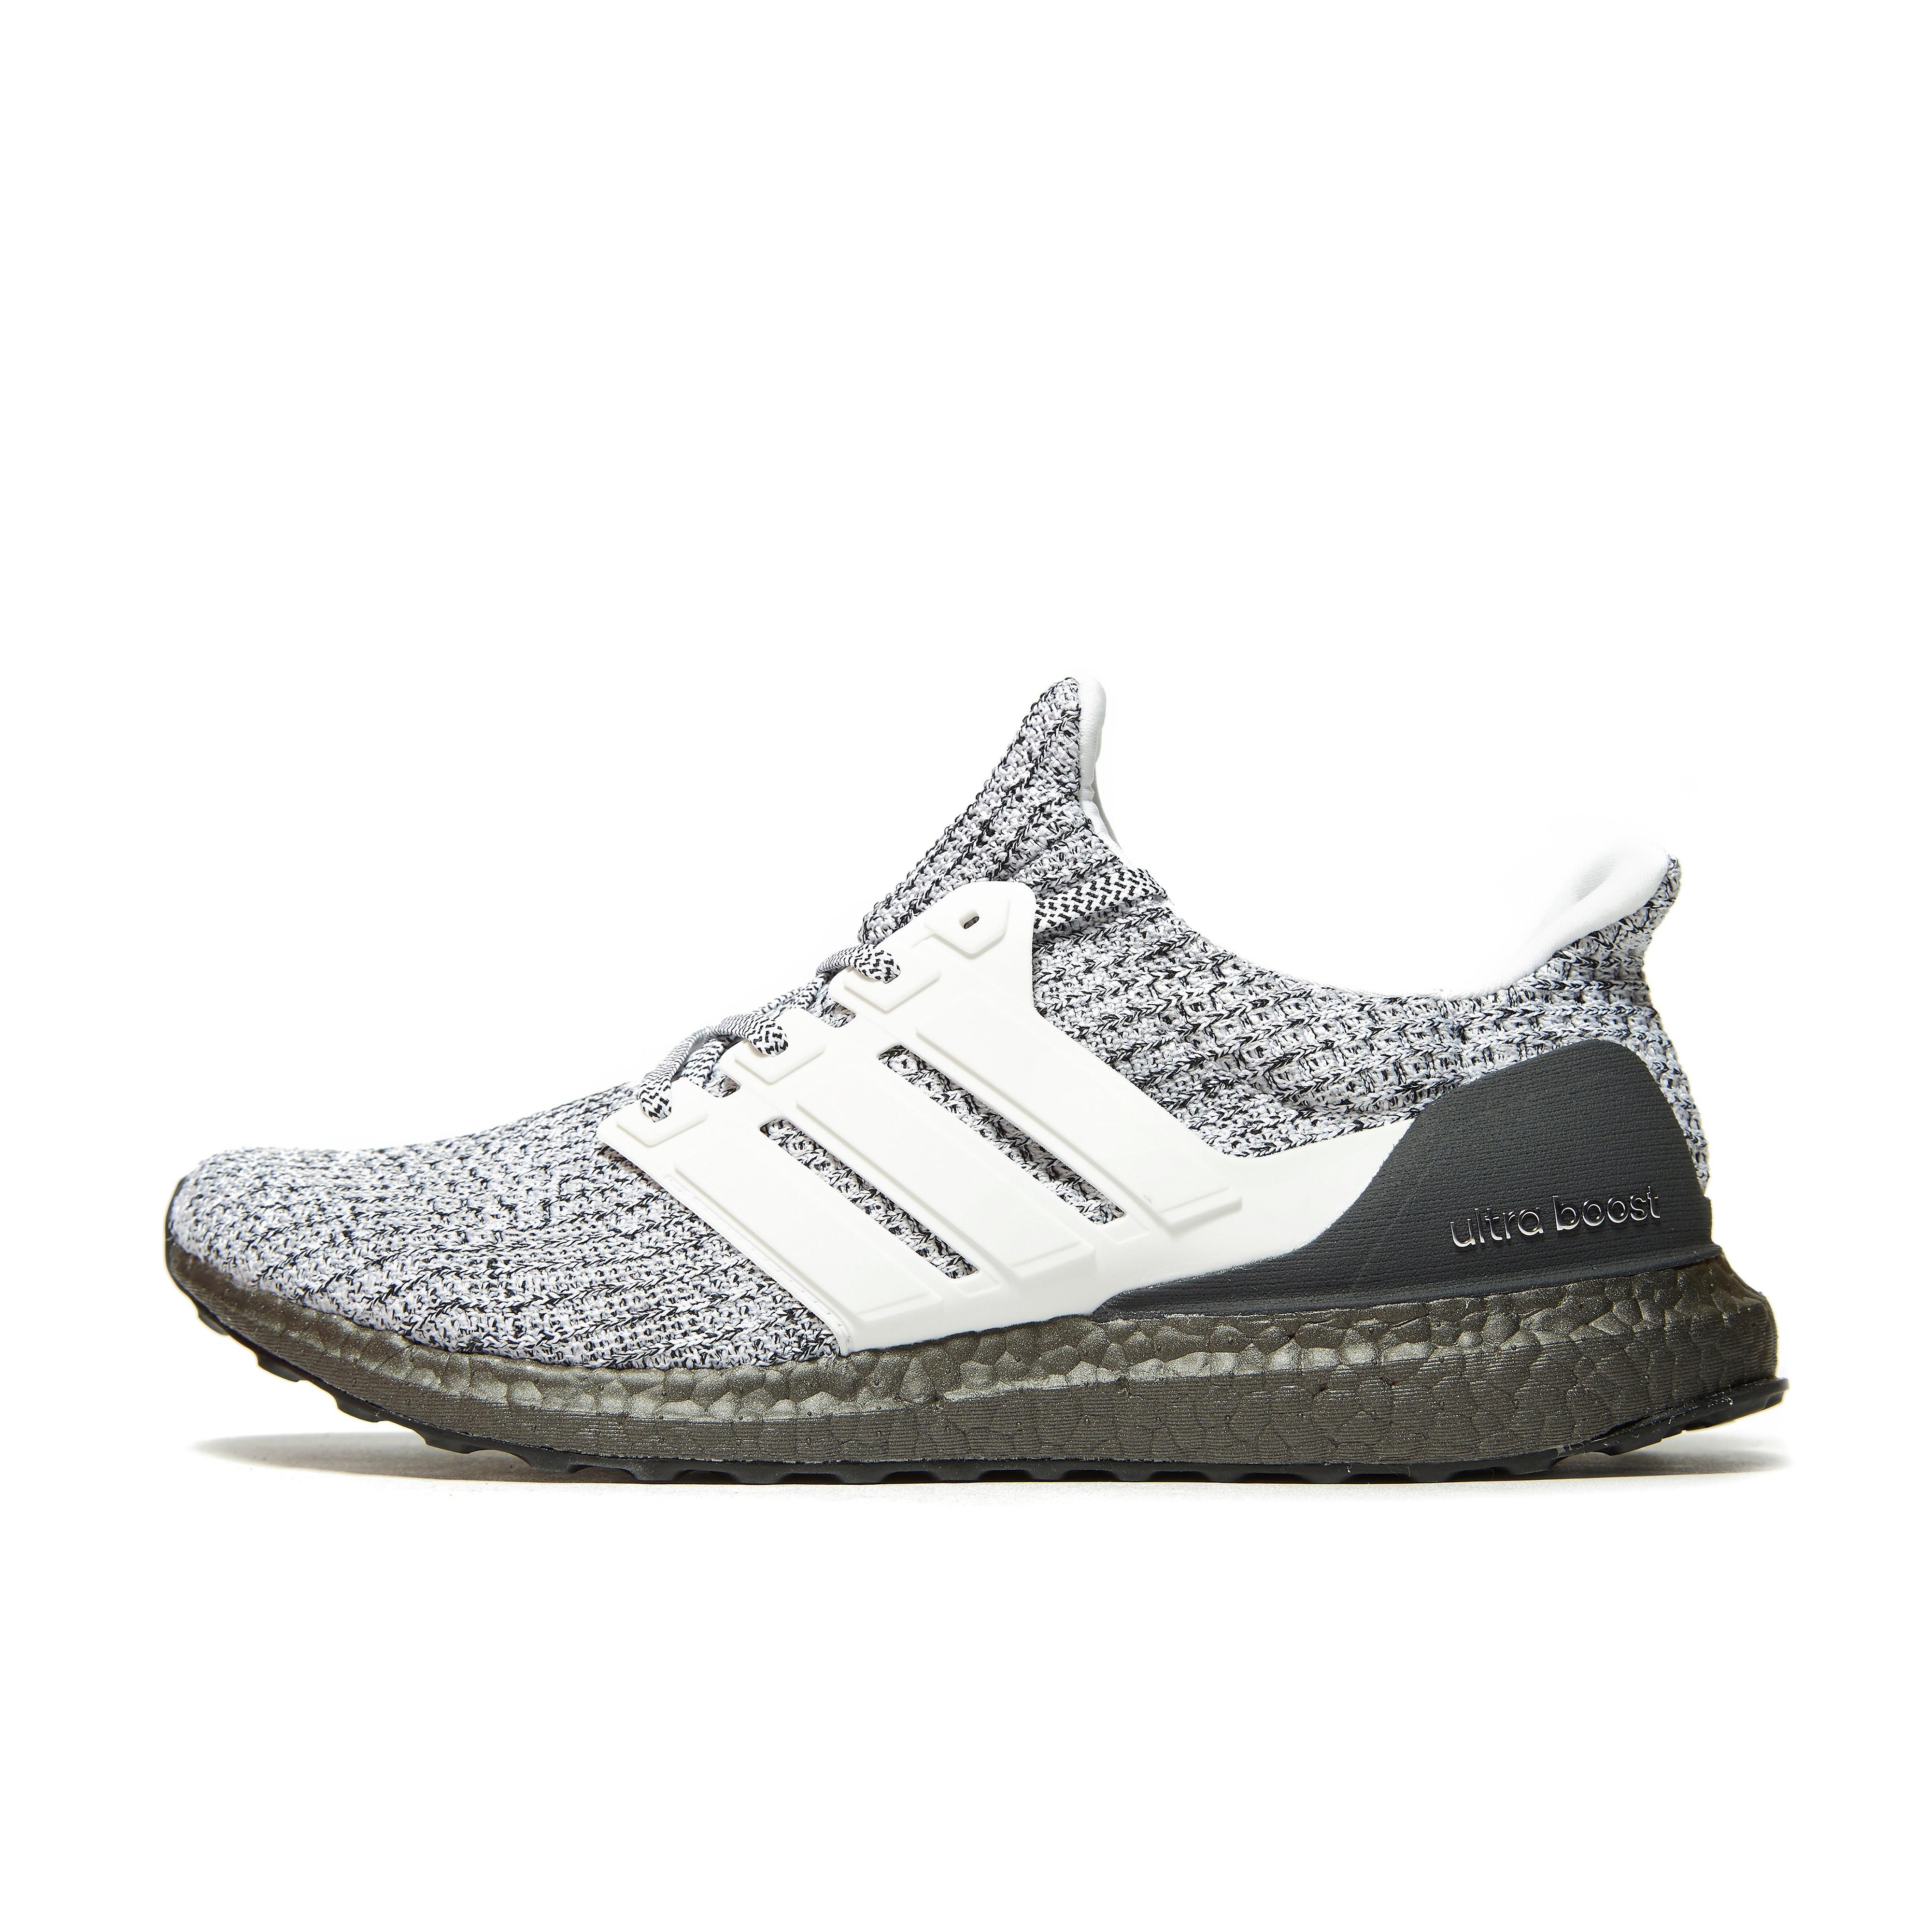 Men's adidas Ultraboost Running Shoes - Light Grey, Light Grey